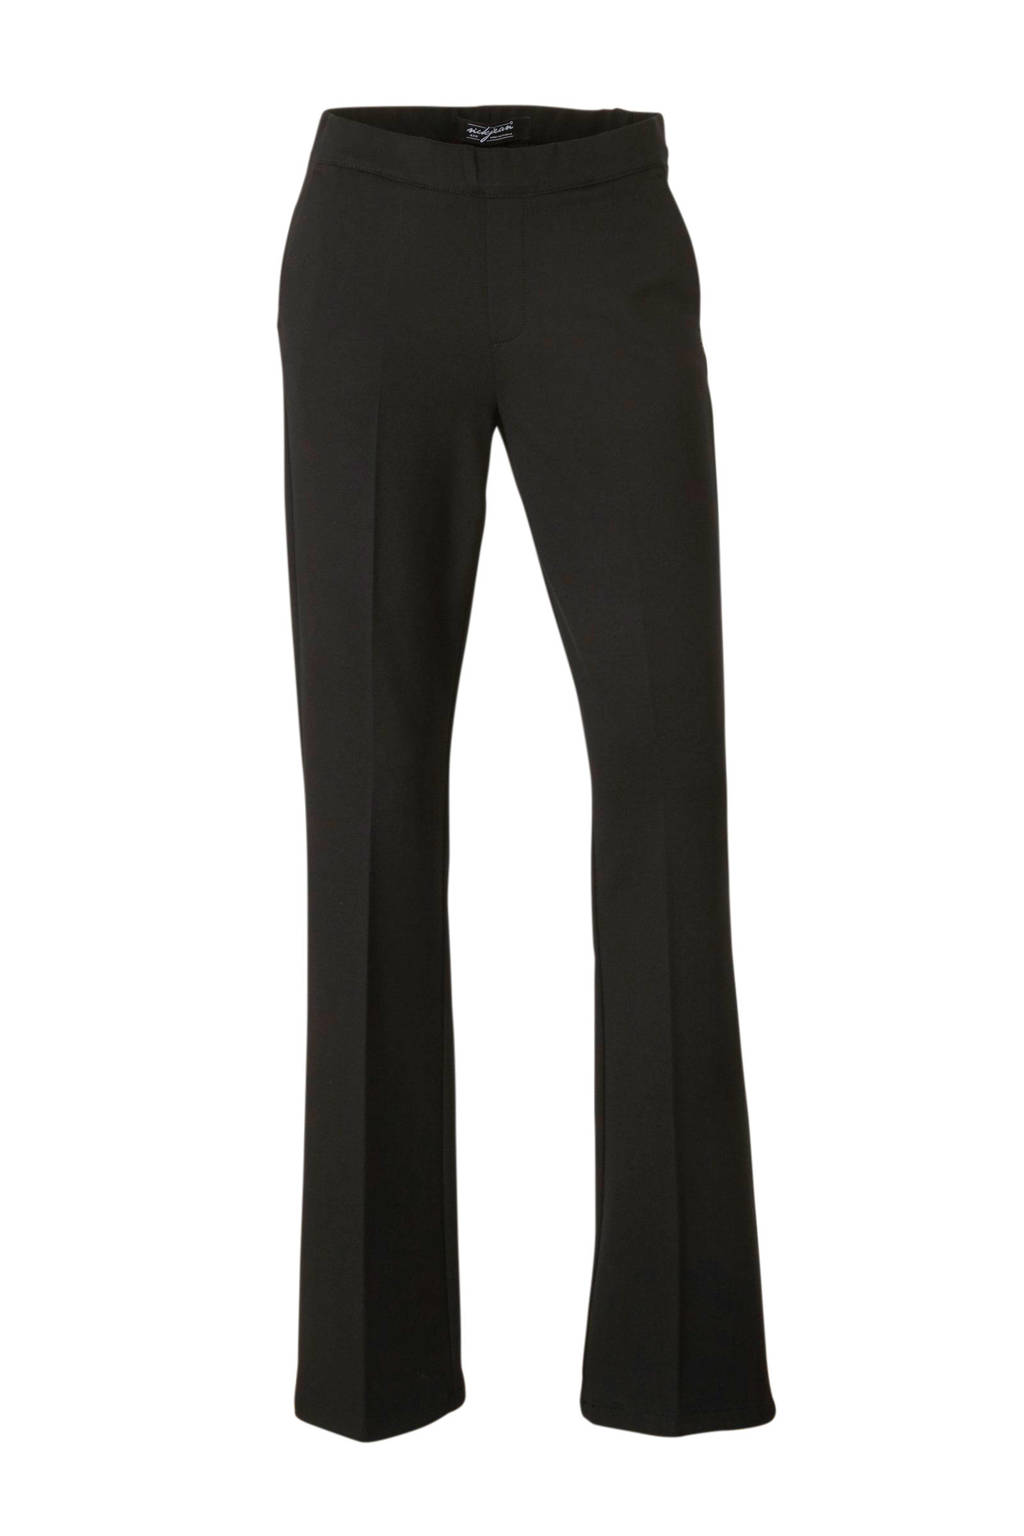 NickJean straight fit pantalon zwart, Zwart